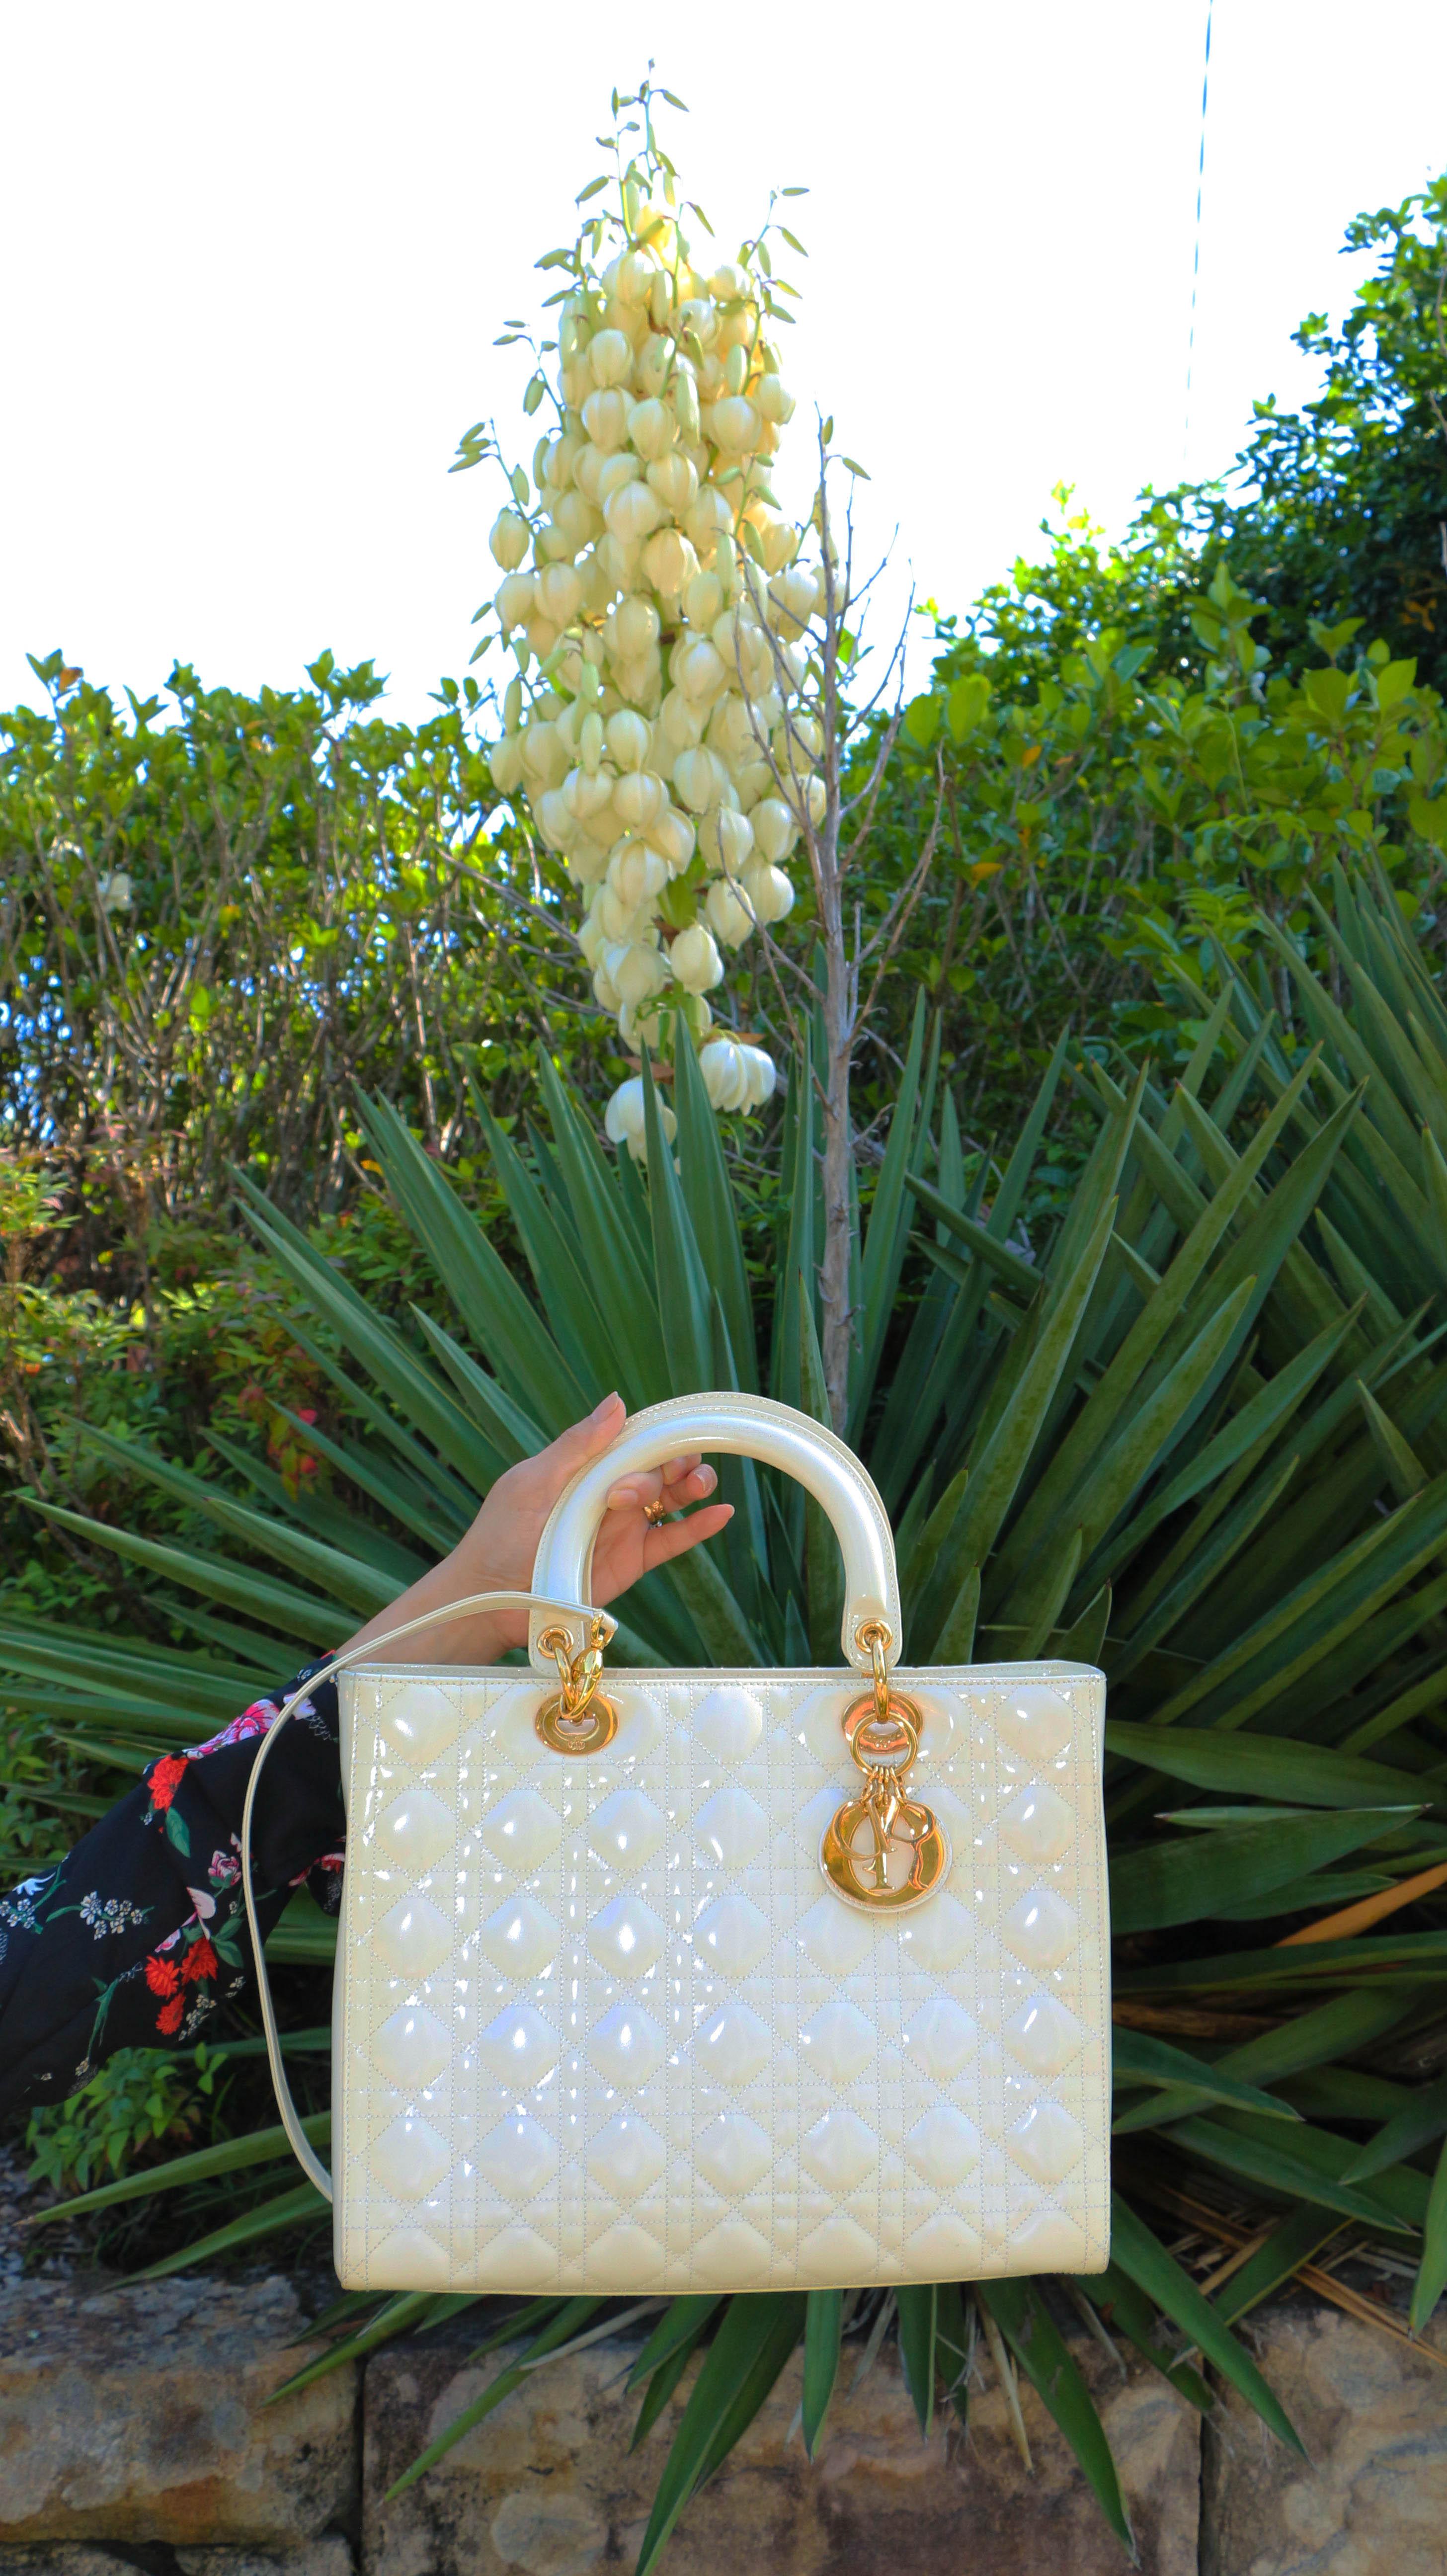 Lady Dior Large bag